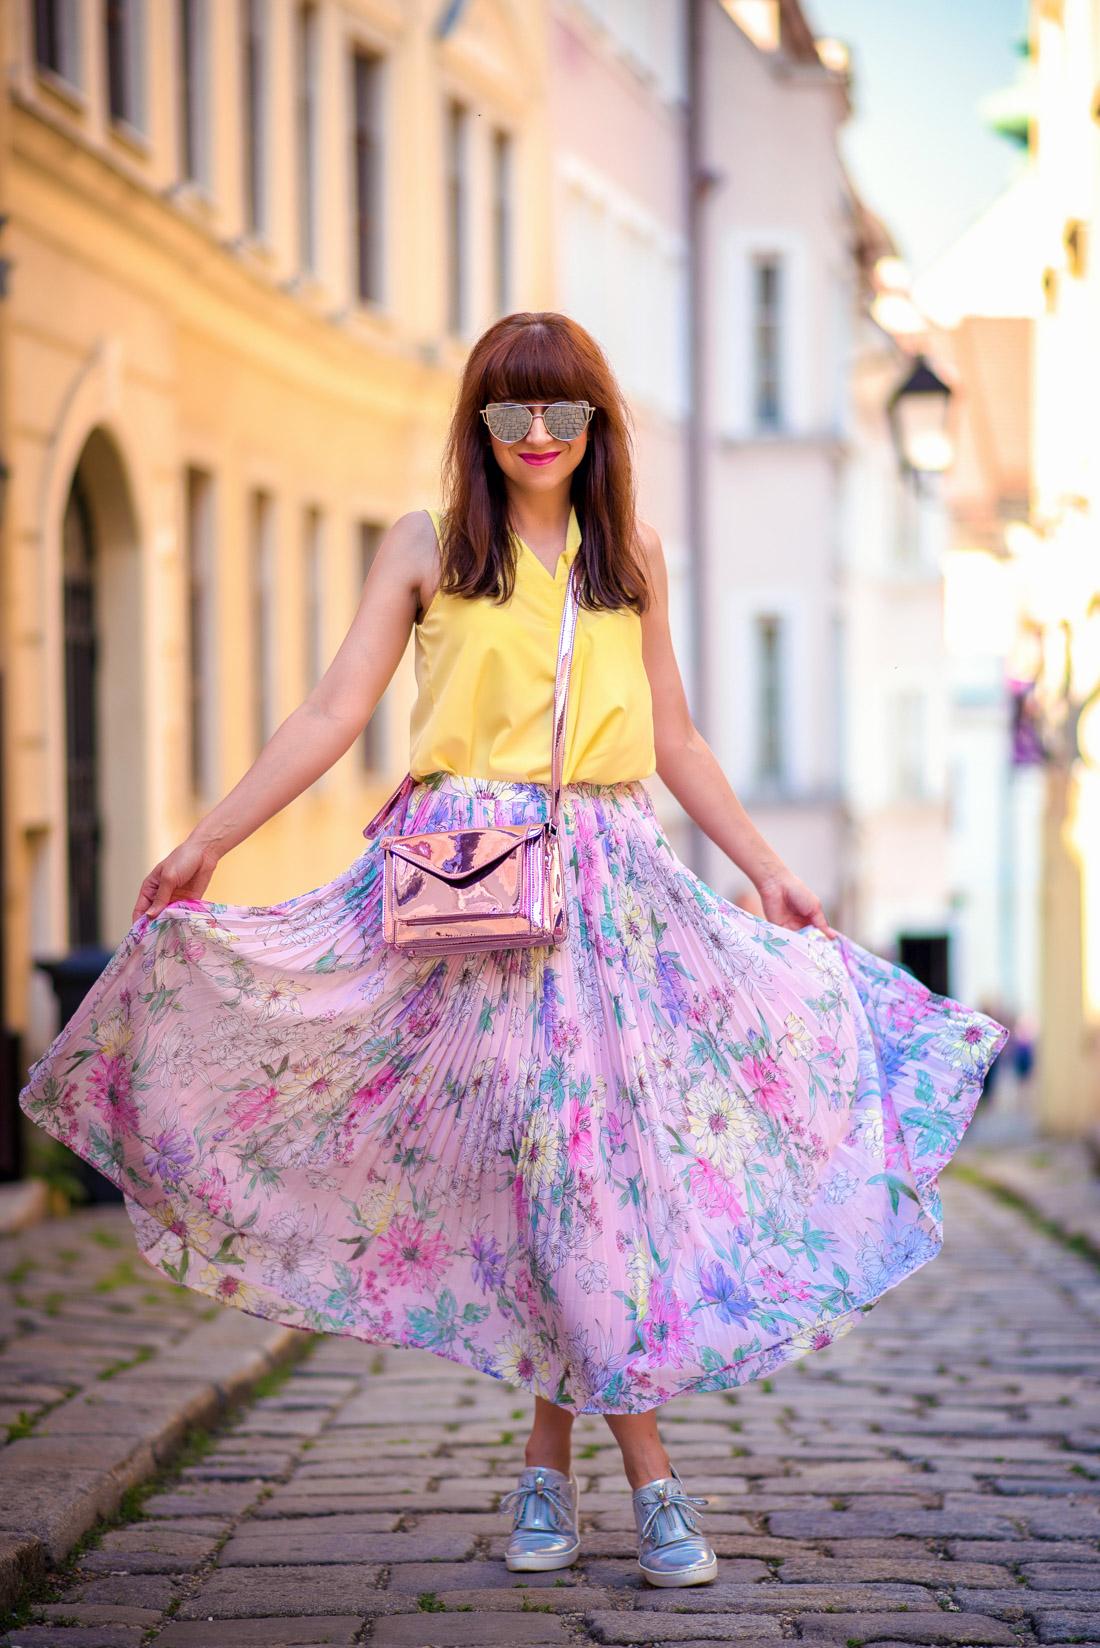 SUKŇA, KTORÁ VÁM VYRAZÍ DYCH_Katharine-fashion is beautiful_blog 14_Kvetinová plisovaná sukňa_Pastelové farby_Kabelka od Answear_Katarína Jakubčová_Fashion blogerka